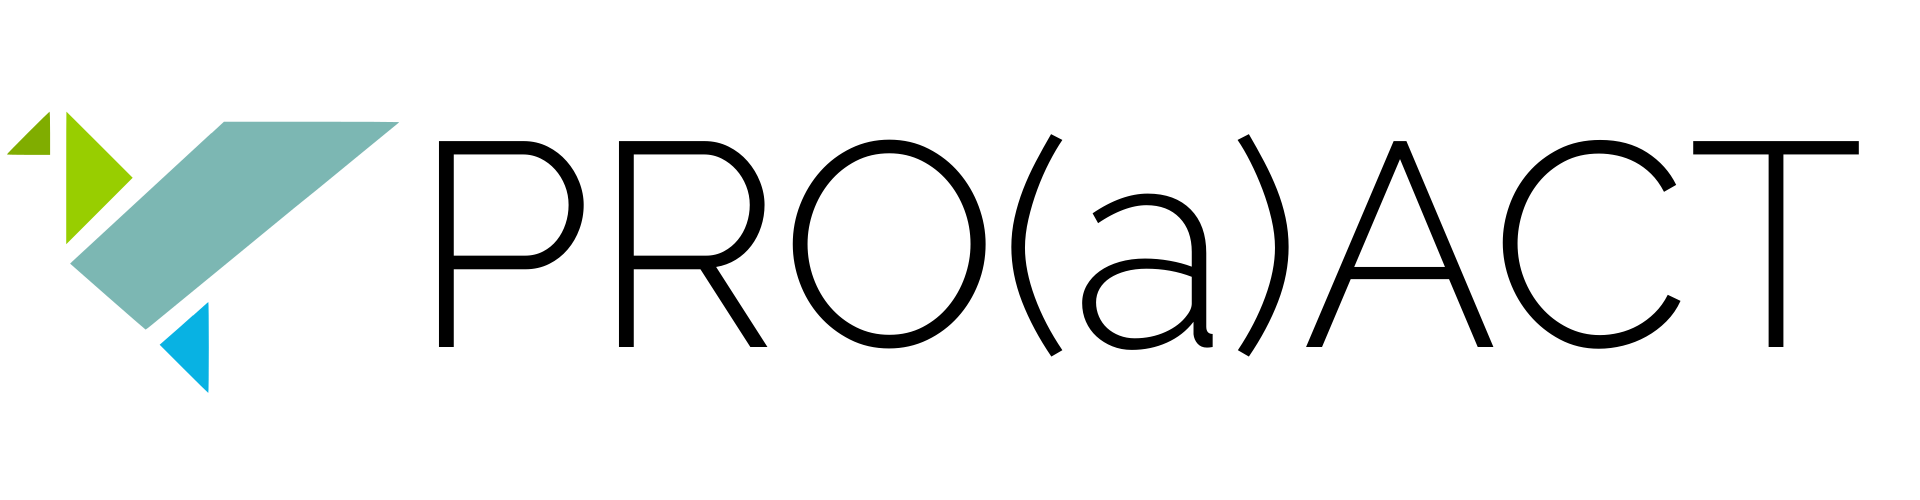 PRO(a)ACT logo black